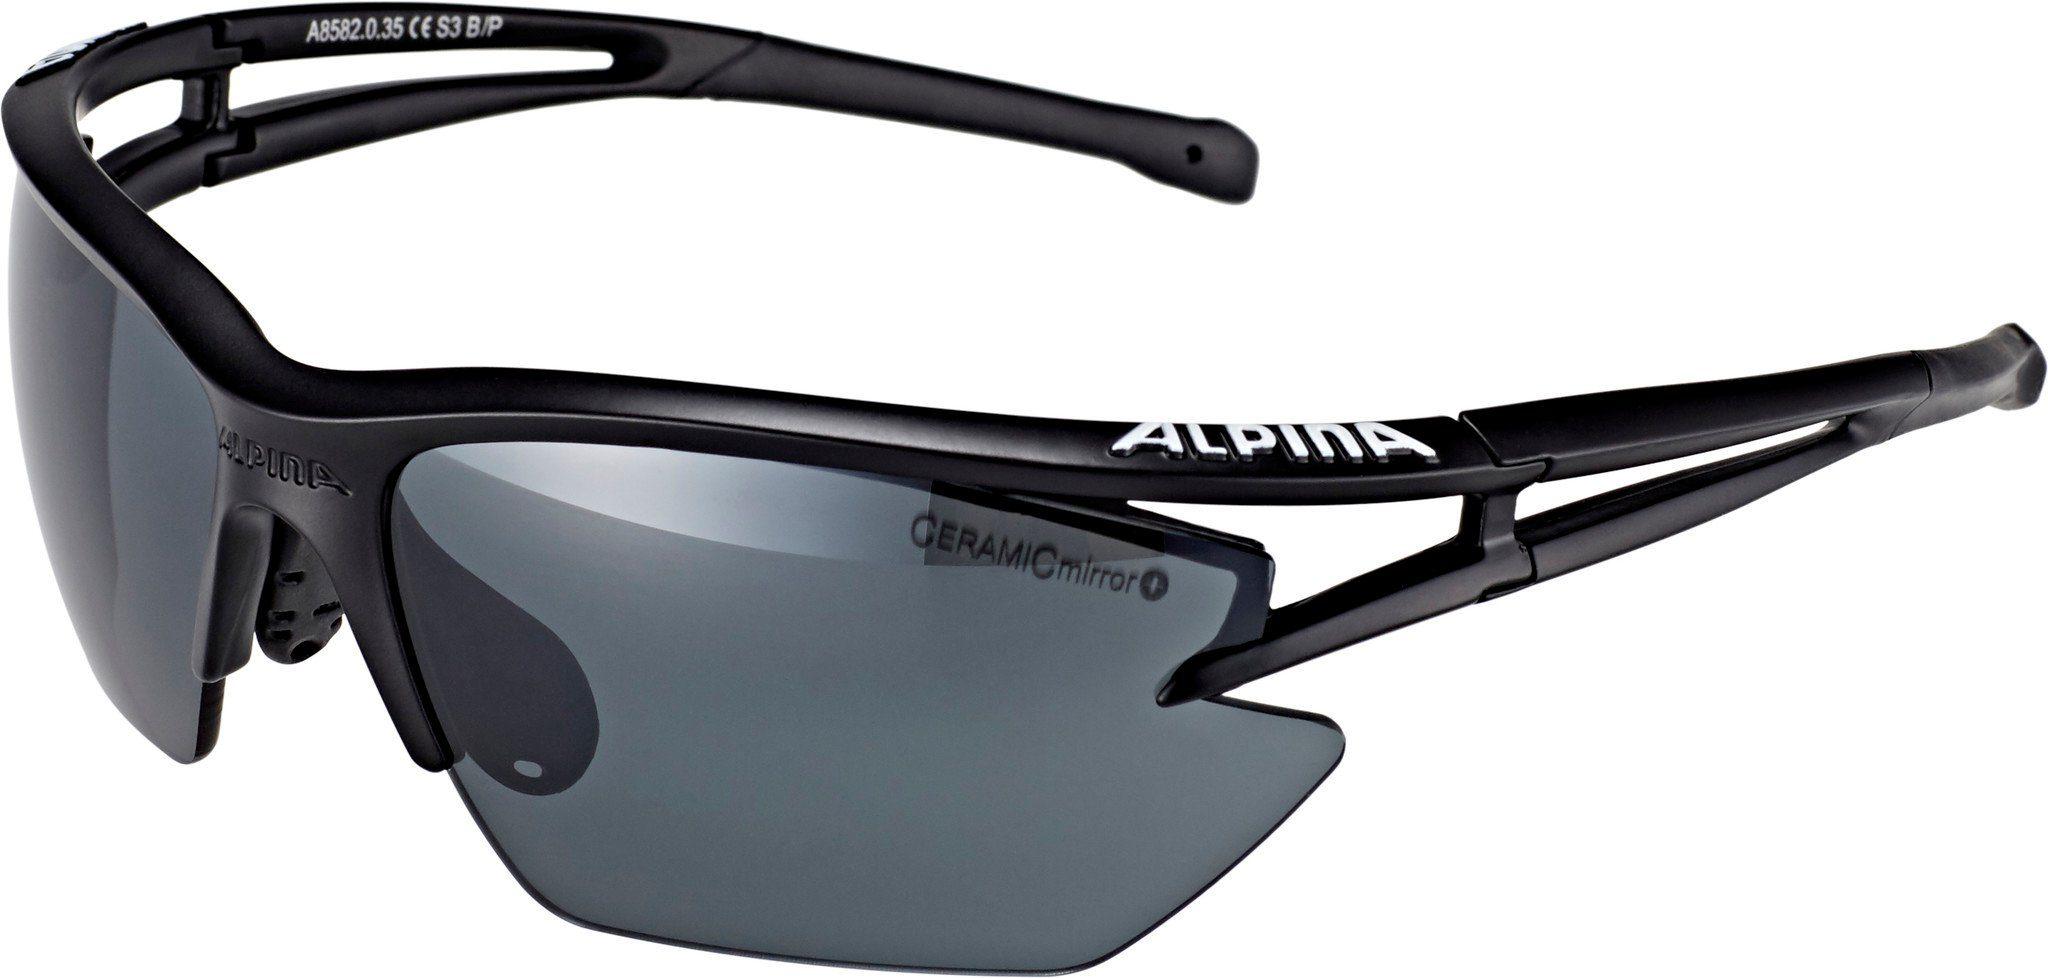 Alpina Sportbrille »Eye-5 HR S CM+«